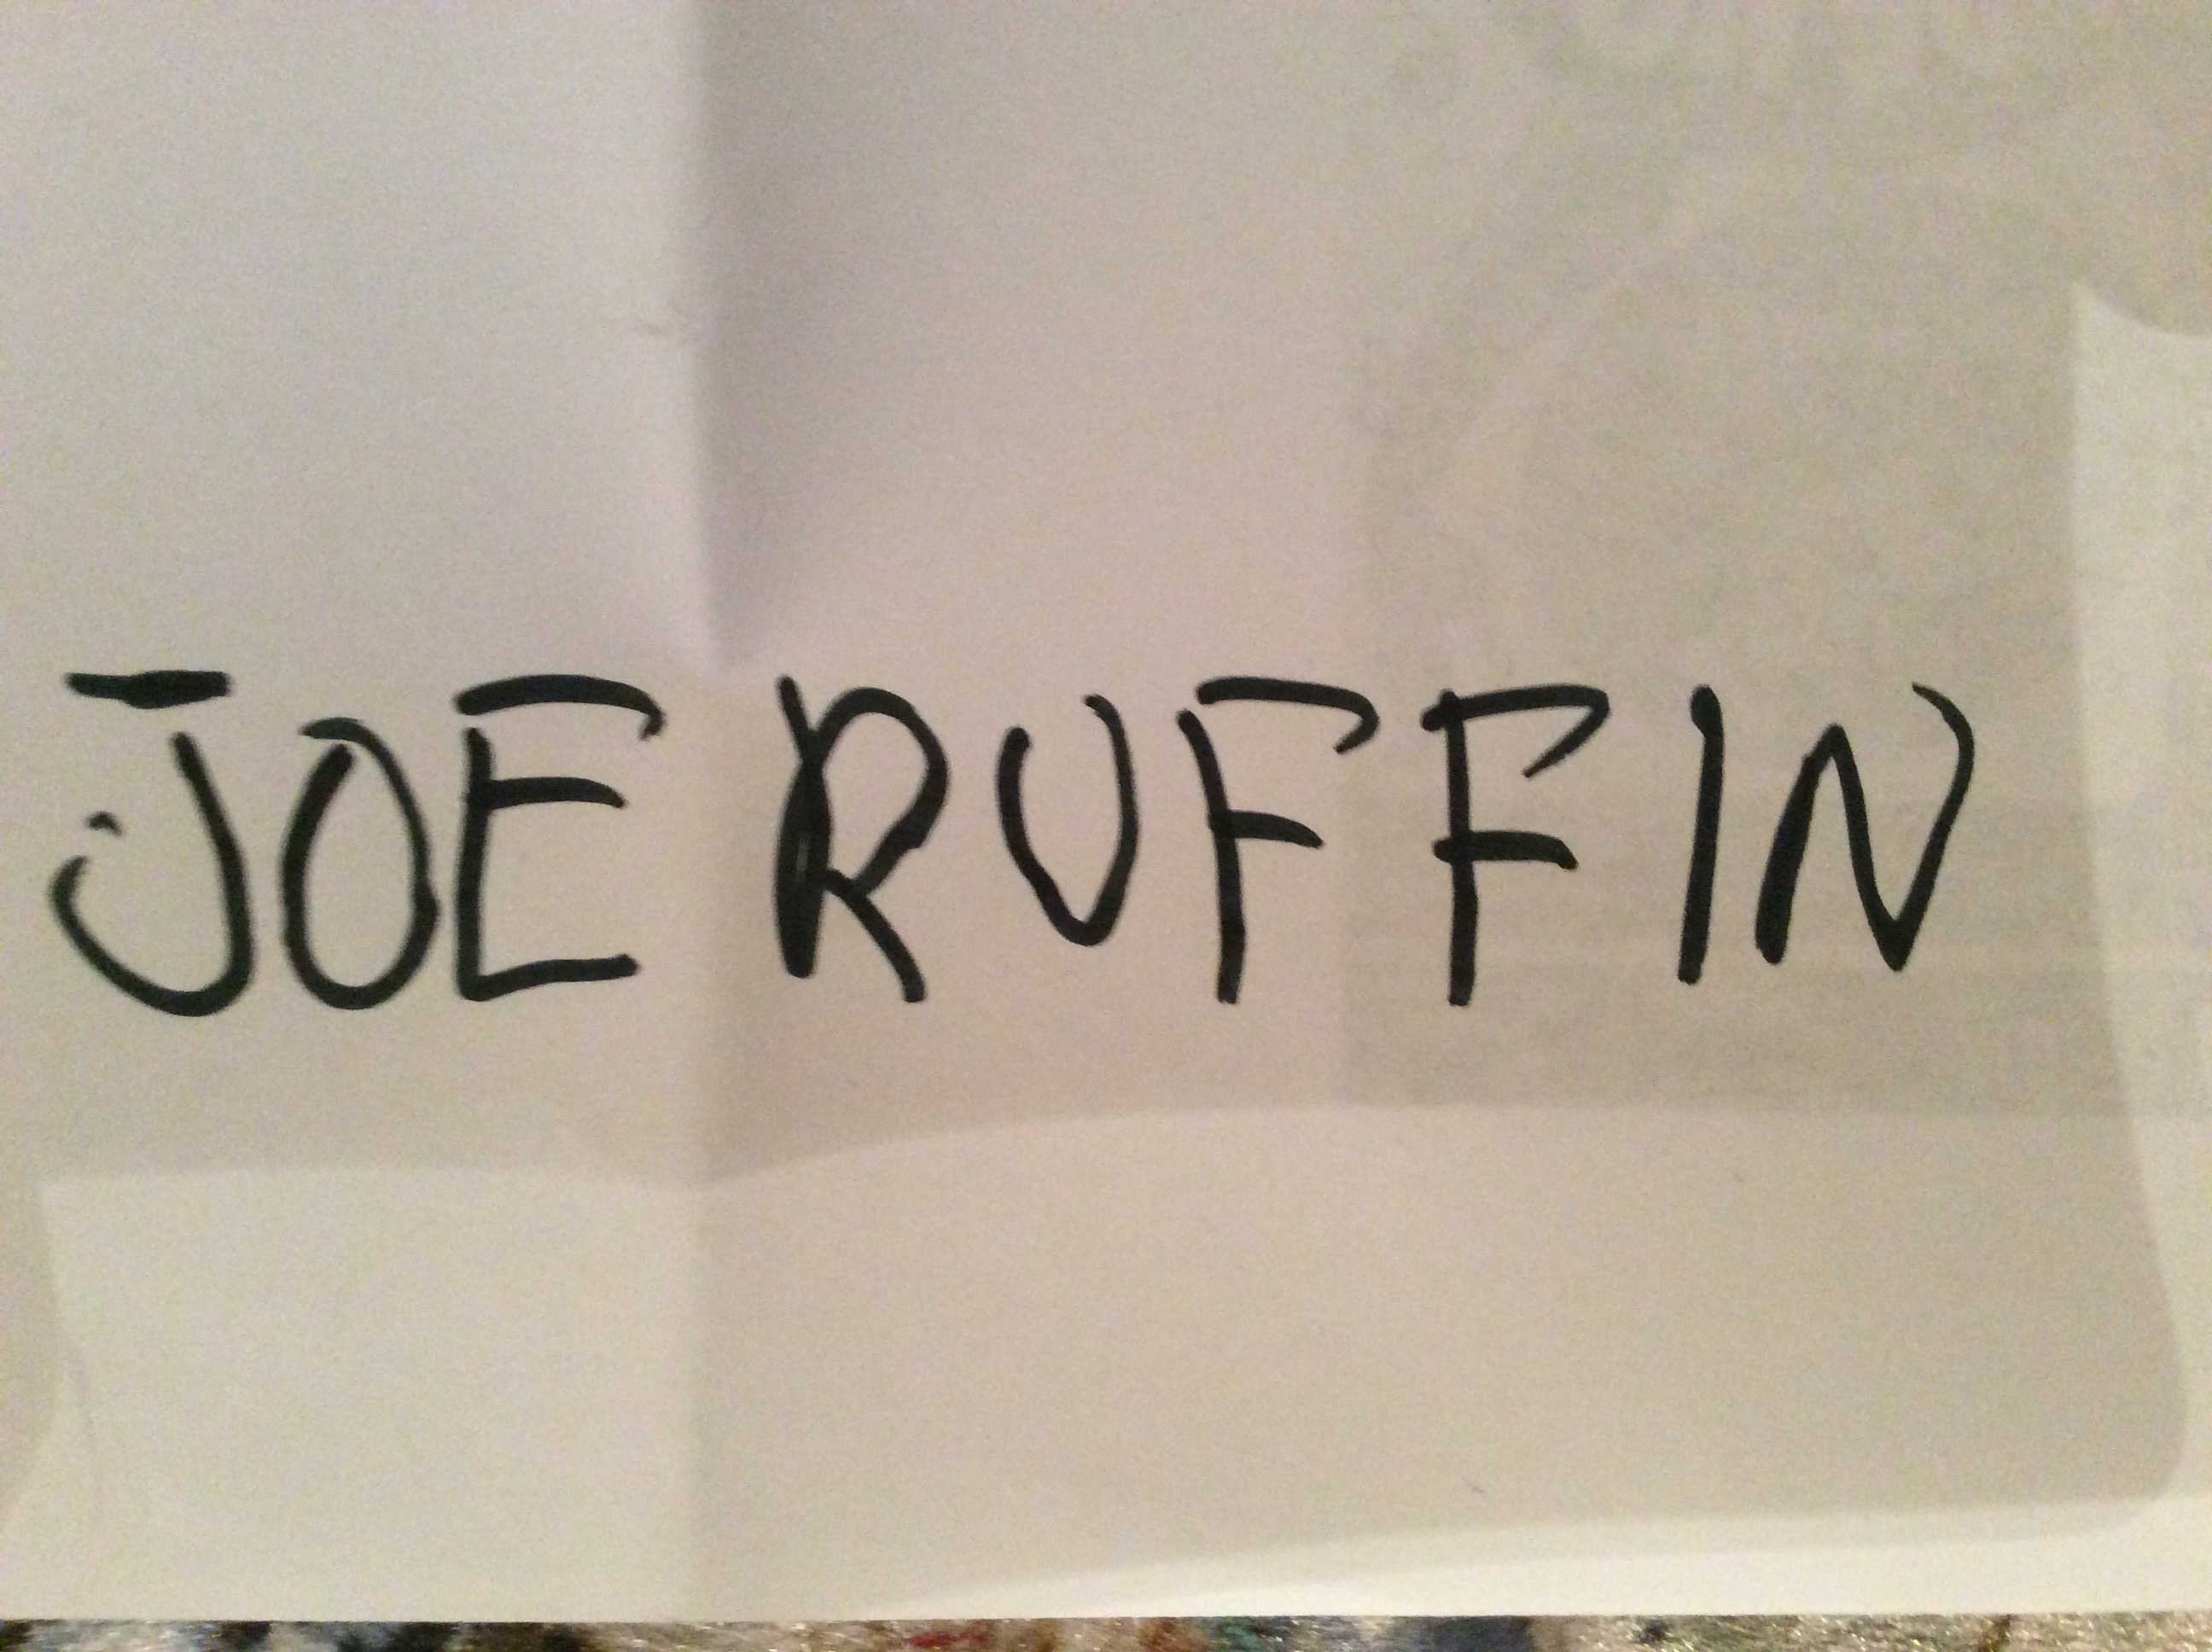 Joe Ruffin's Signature